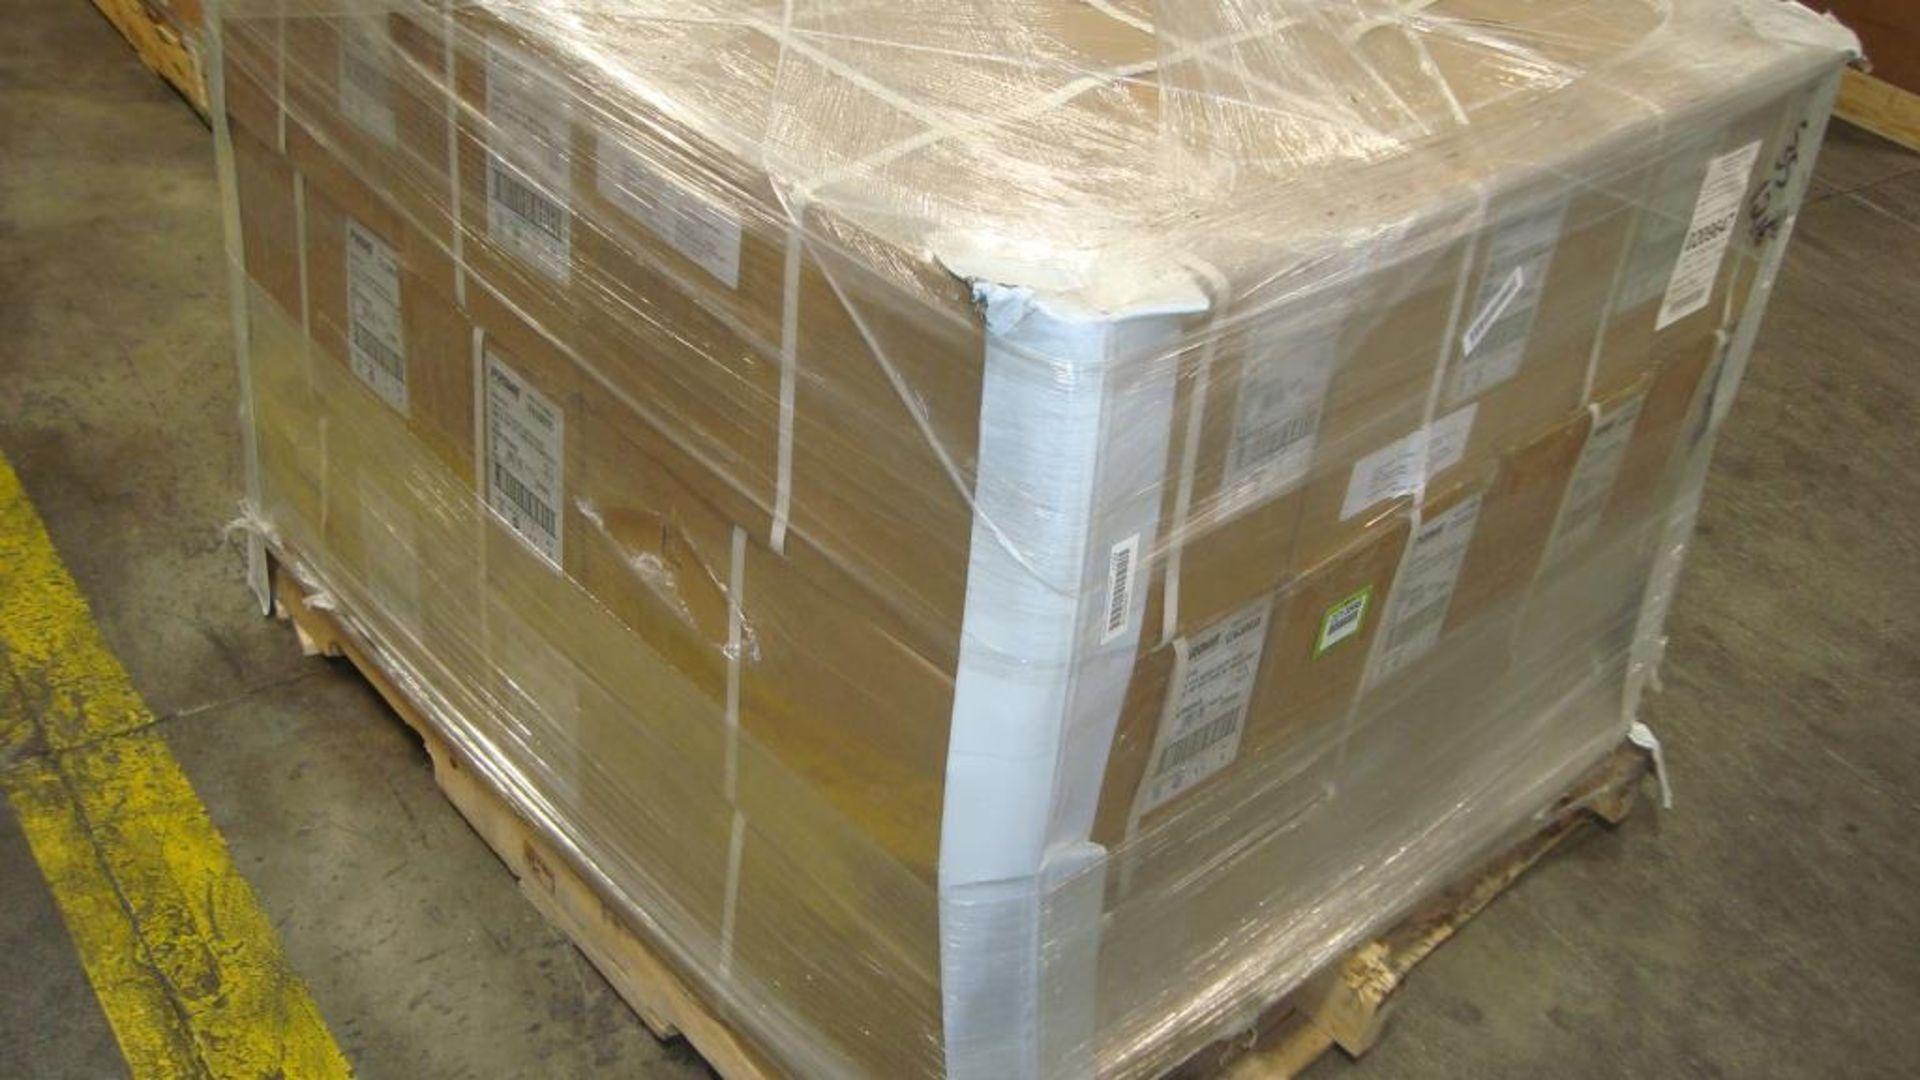 Extension Cords. Lot: 90 Total (30 Boxes - 3 ea.) Prime Wire & Cable pn# LT630835 Arctic Blue 100 - Image 9 of 9